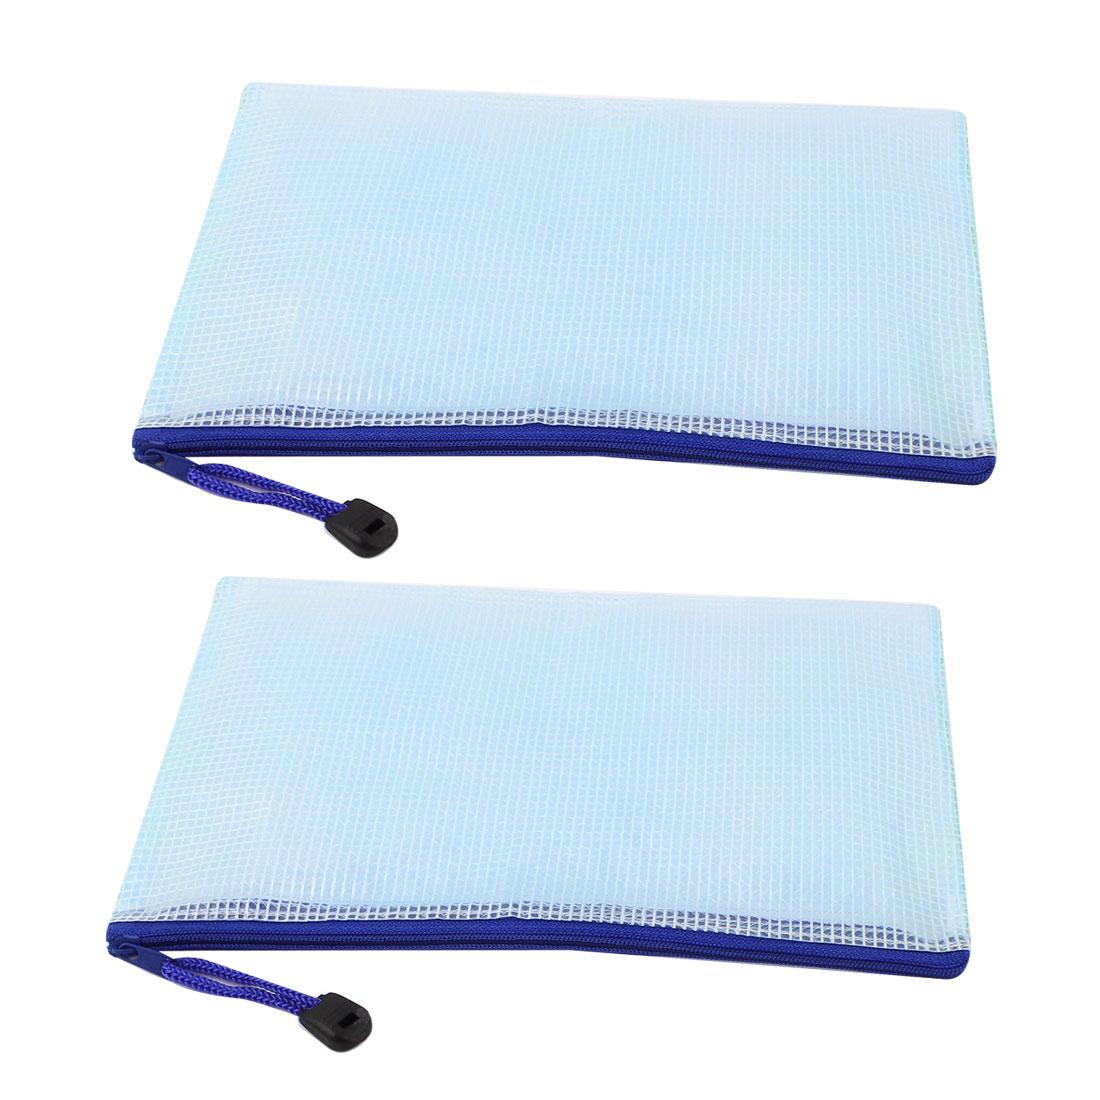 Zippered PVC Mesh Checkbook ID A5 Document File Bag Holder Pouch Blue 2pcs